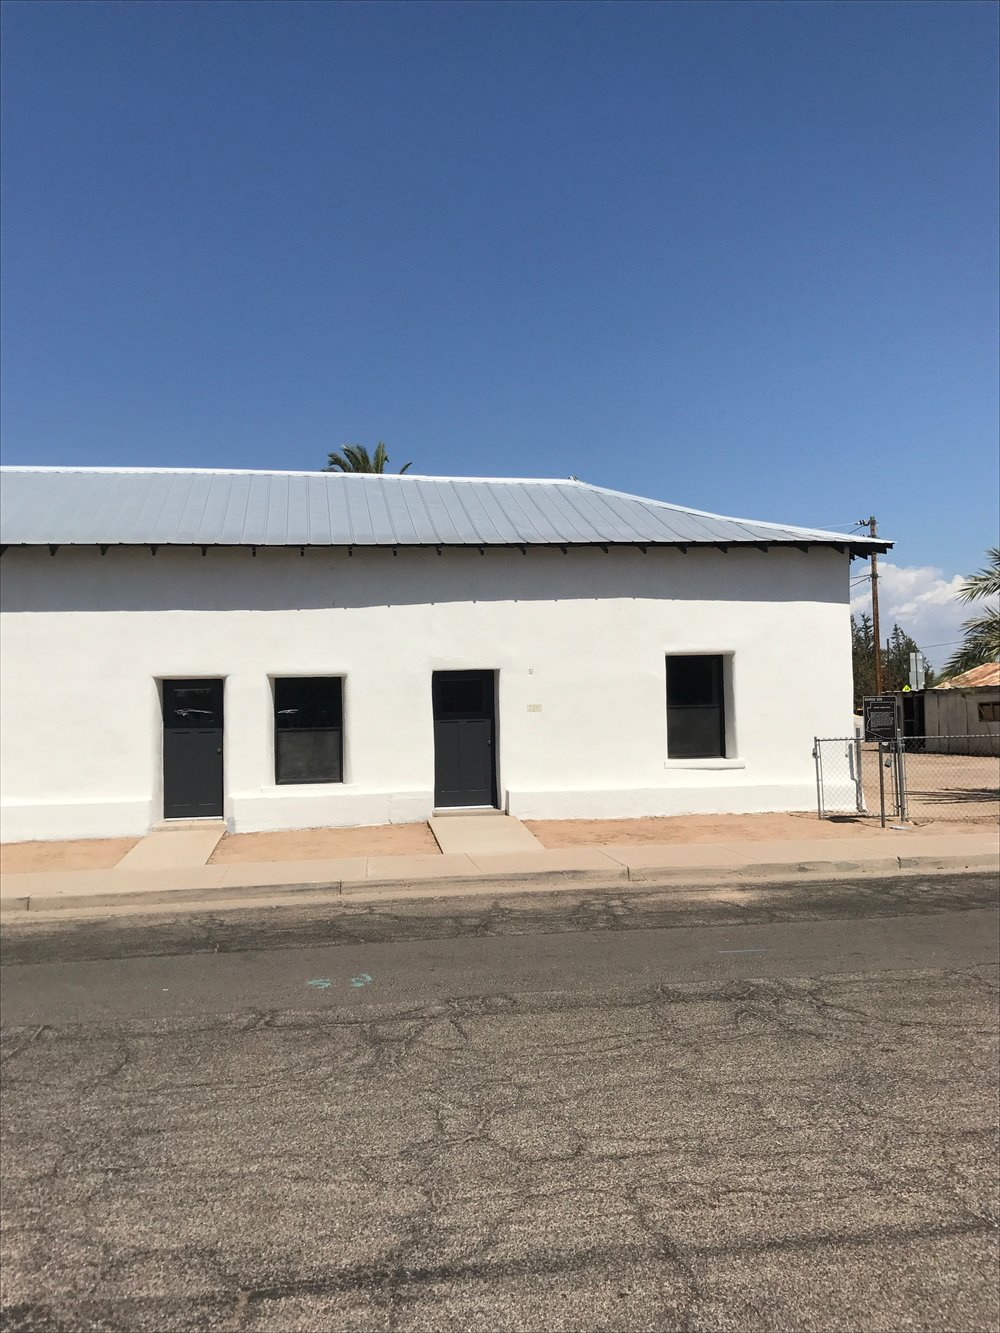 Rowhouse25 - Tremaine Ranch - Air BNB Rental - Phoenix, Arizona15.JPG